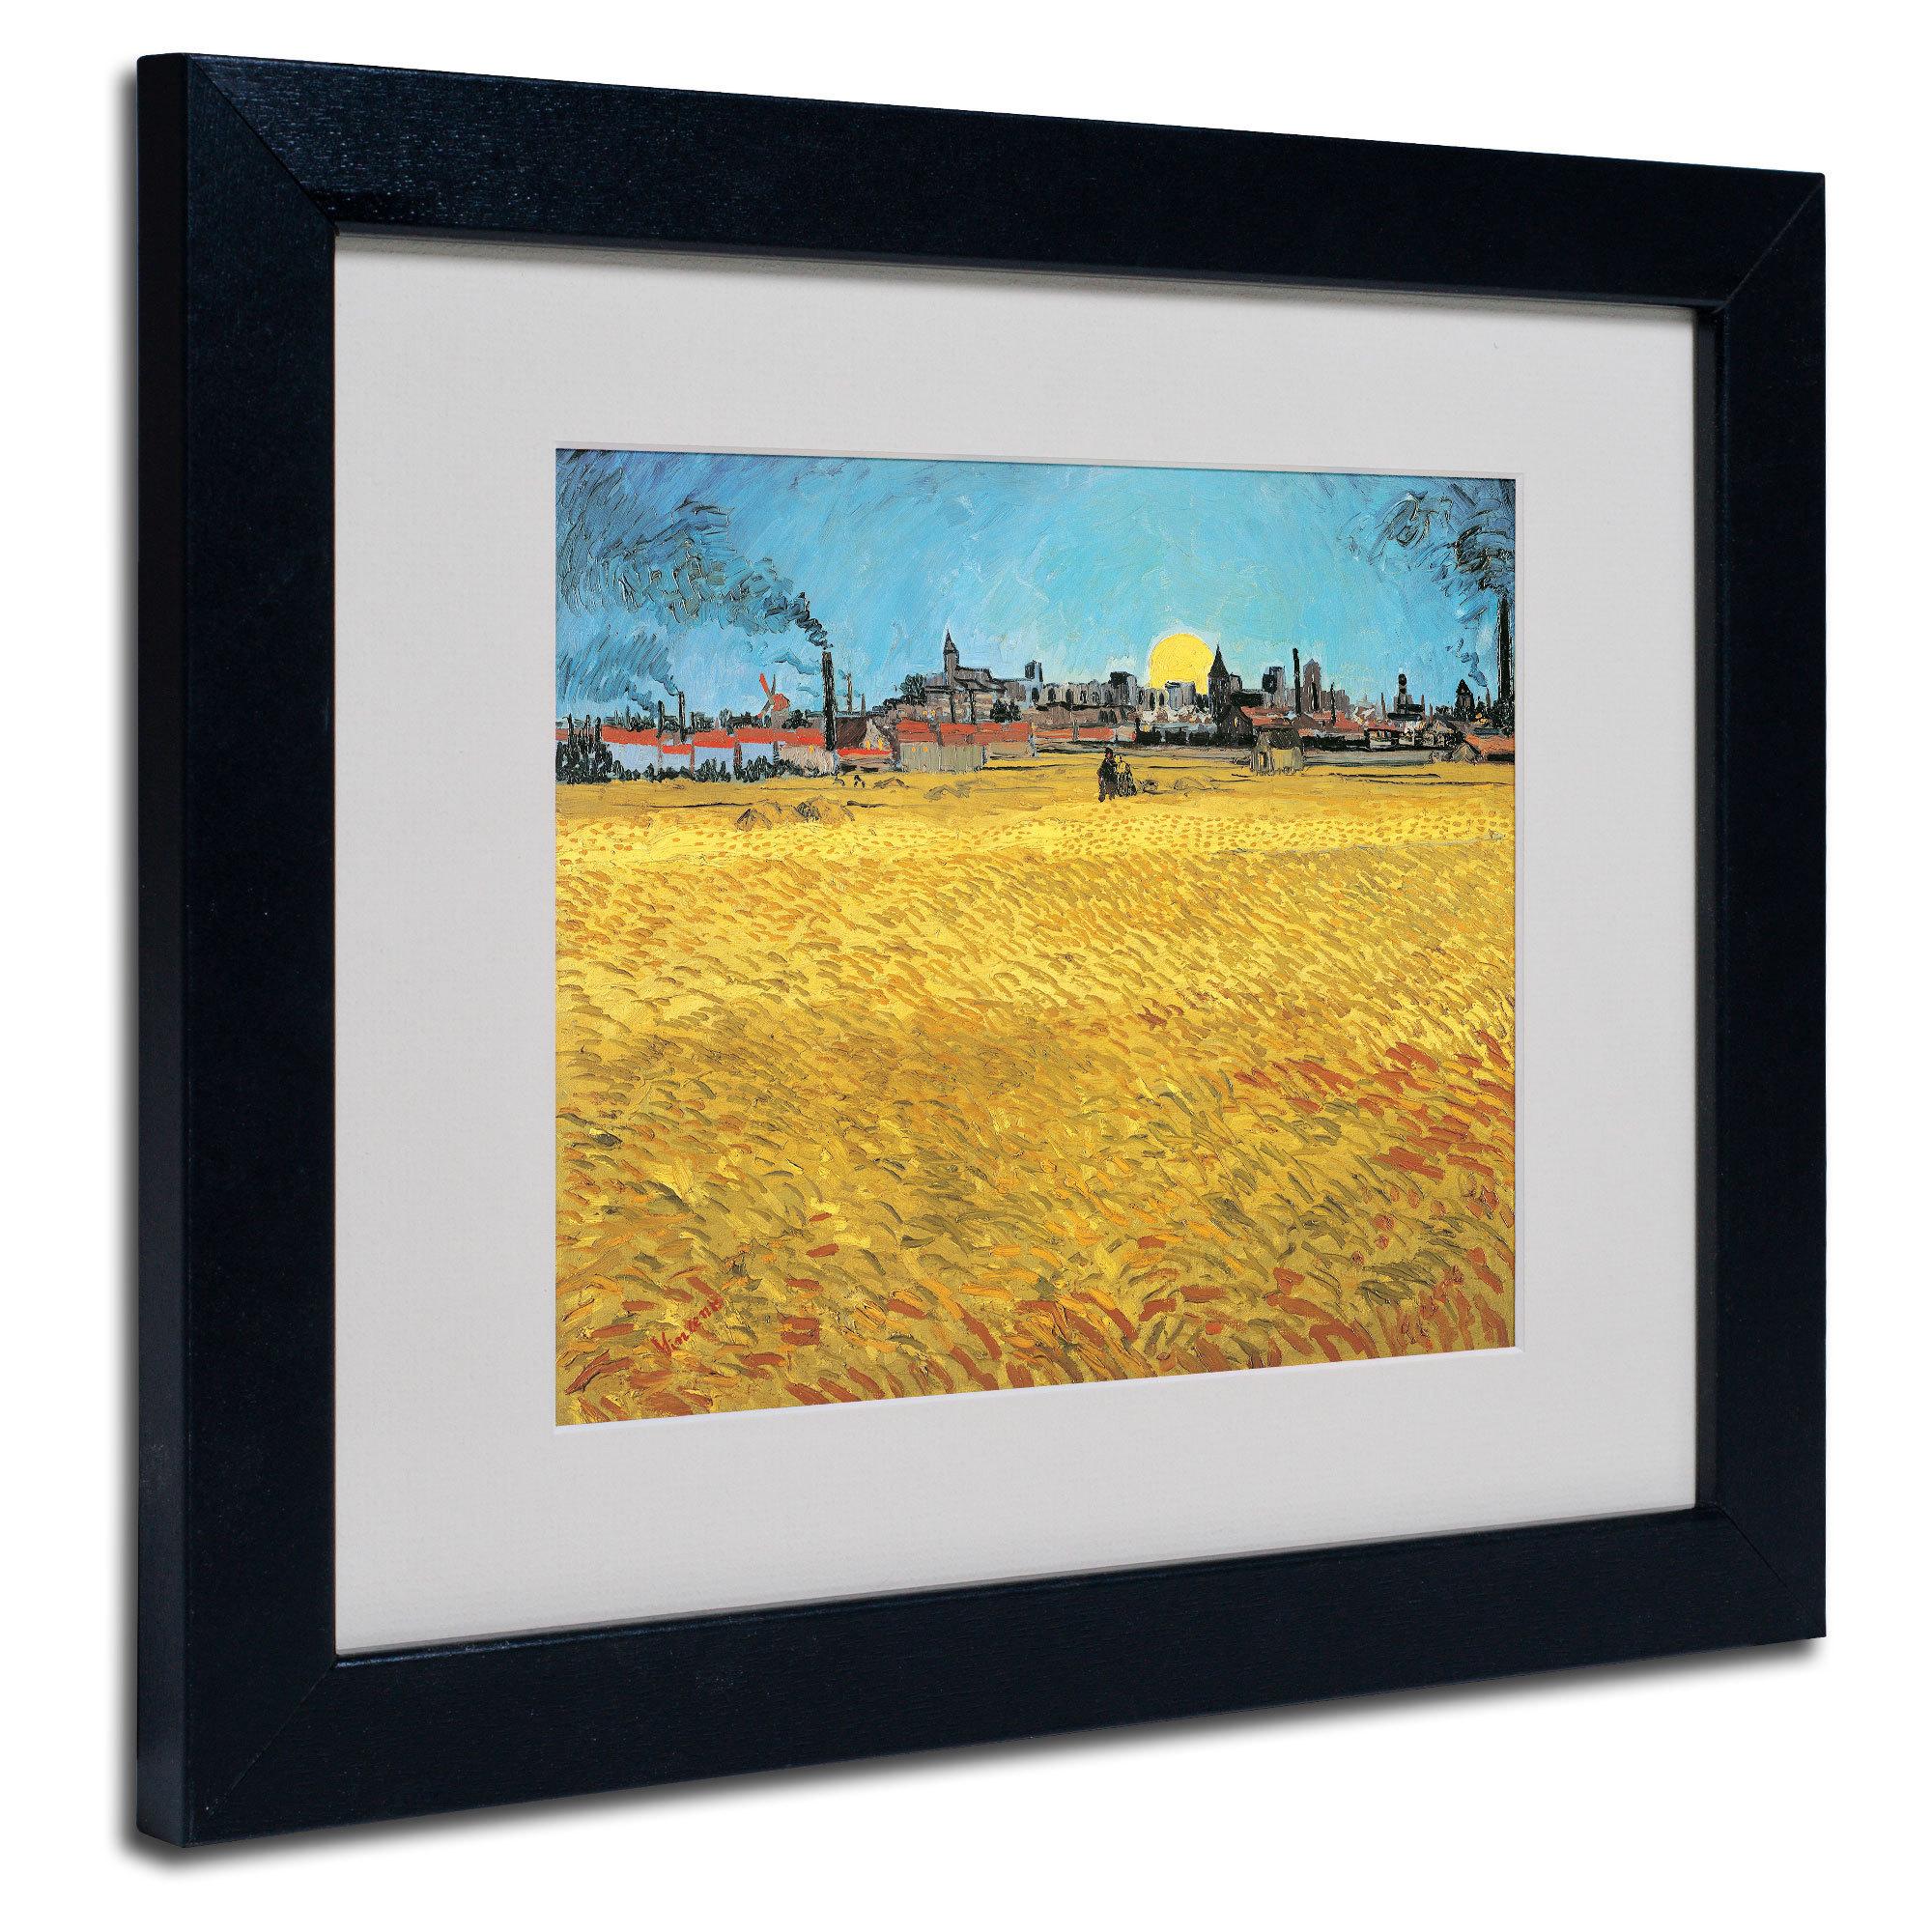 Vincent van Gogh \'Summer Evening 1888\' Framed Matted Art - Free ...